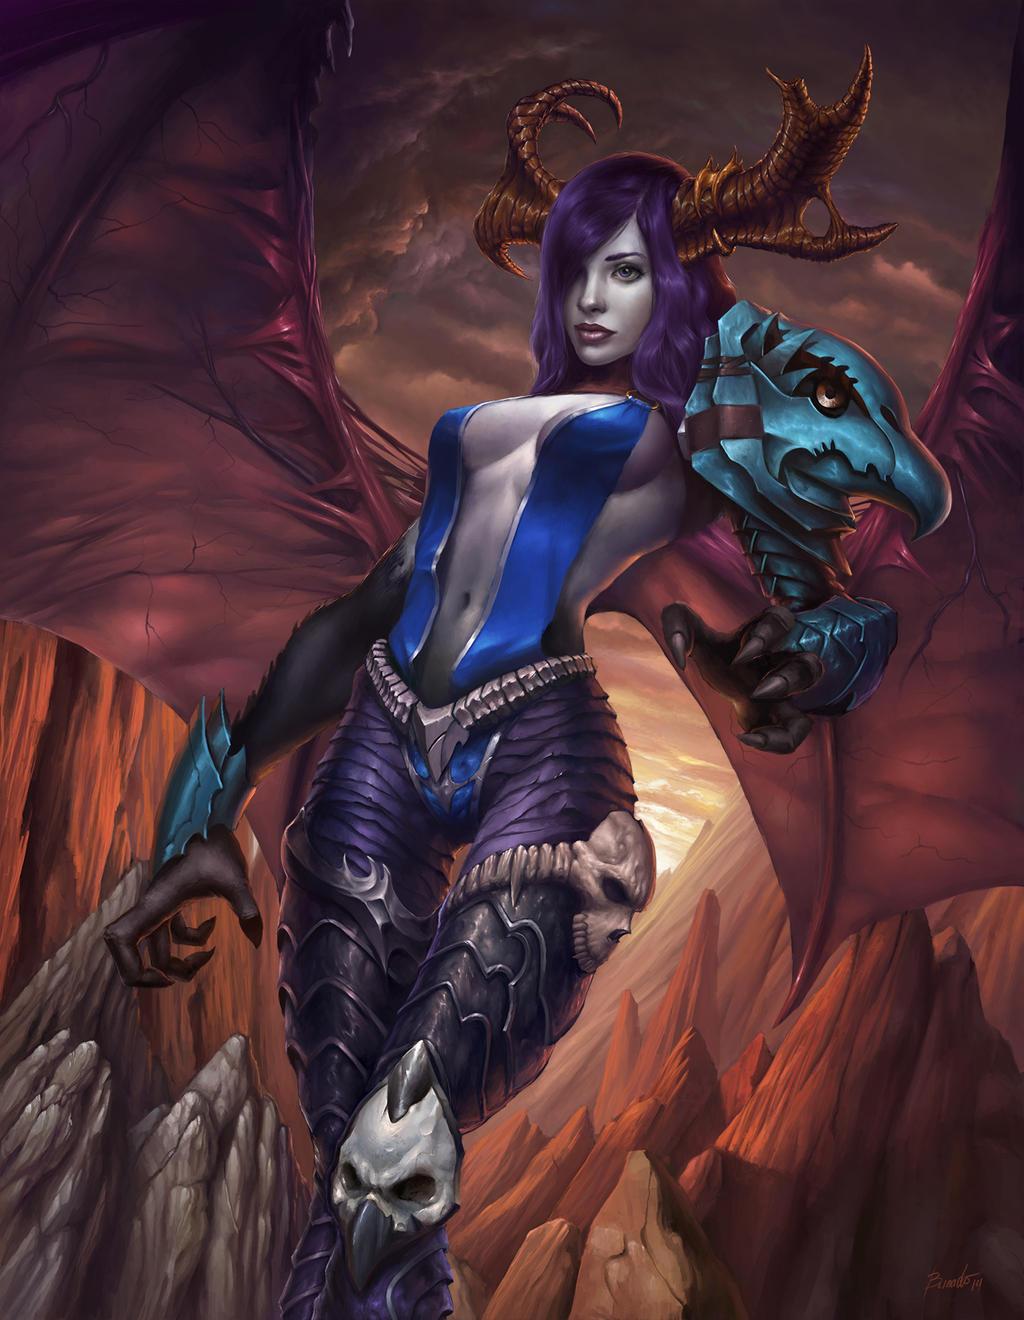 Demonic harpy by Nutfullin